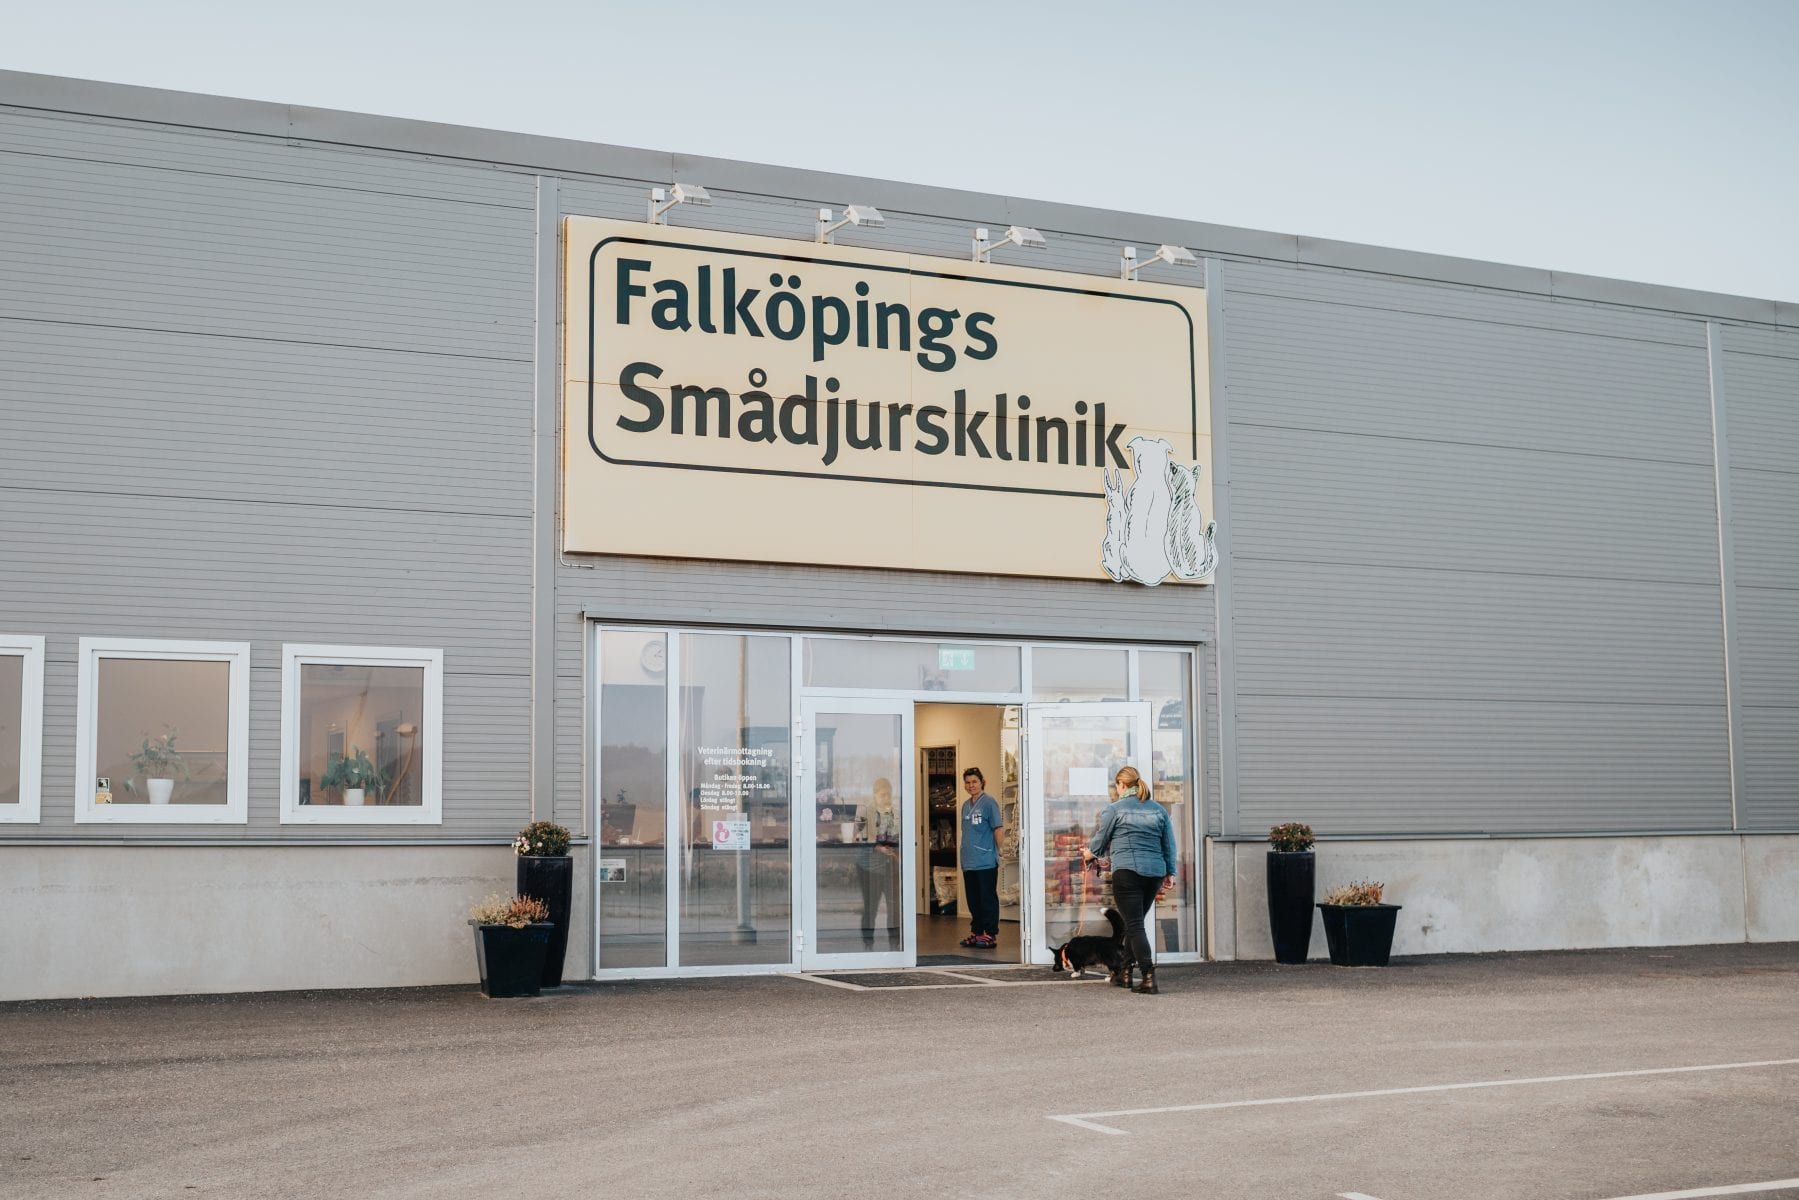 Entré smådjurskliniken i falköping